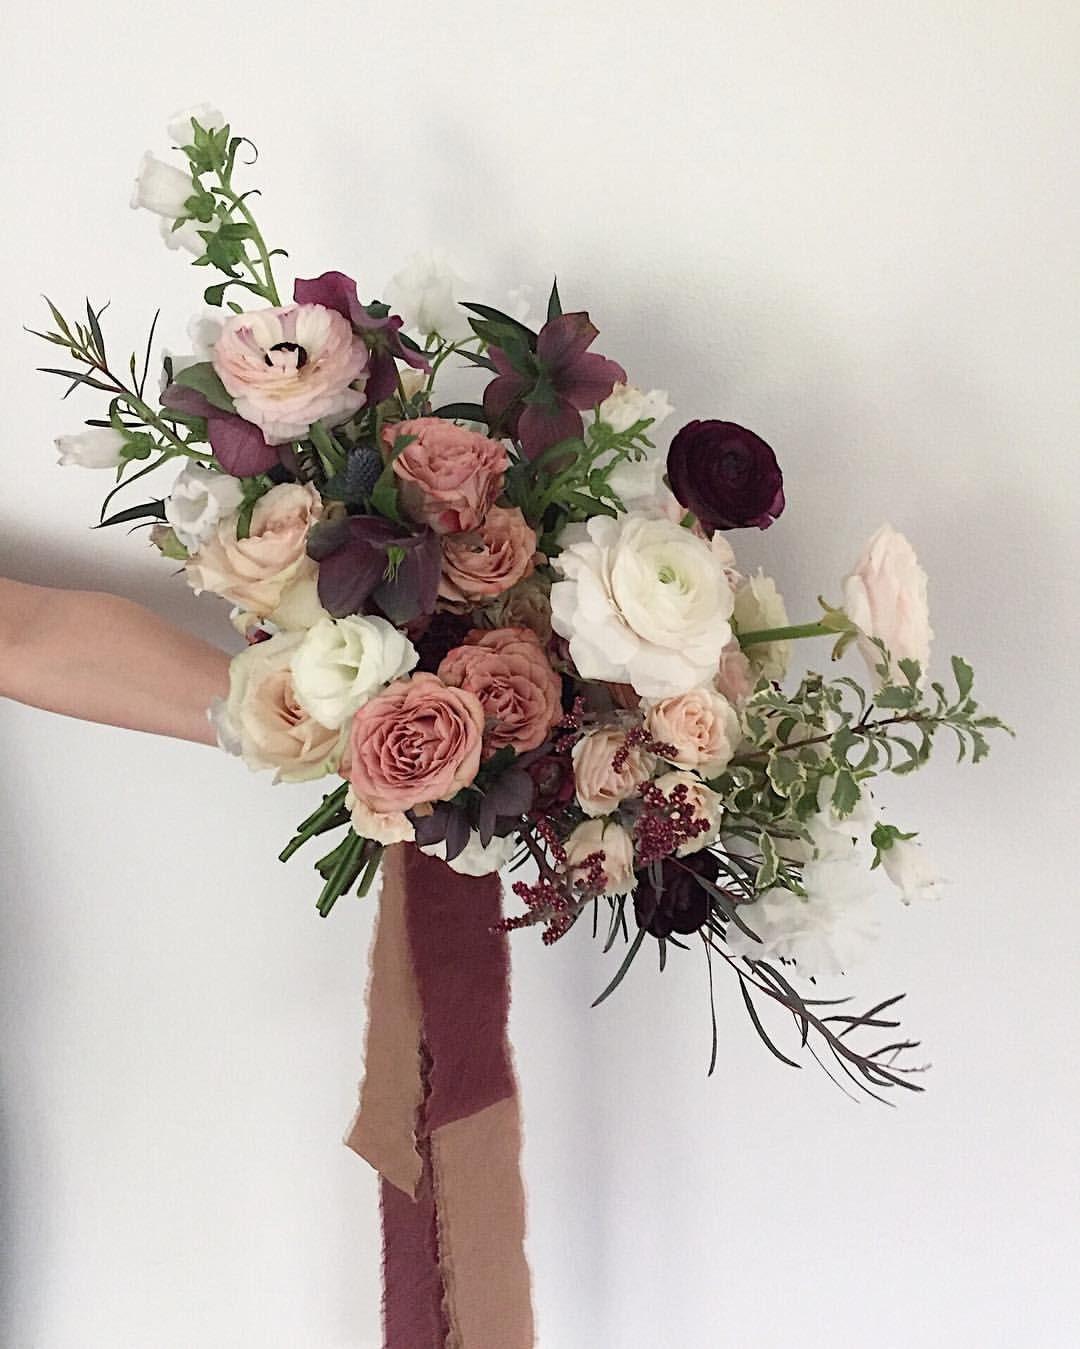 Pinterest Lxciiie Flower Bouquet Wedding Wedding Bouquets Floral Bouquets